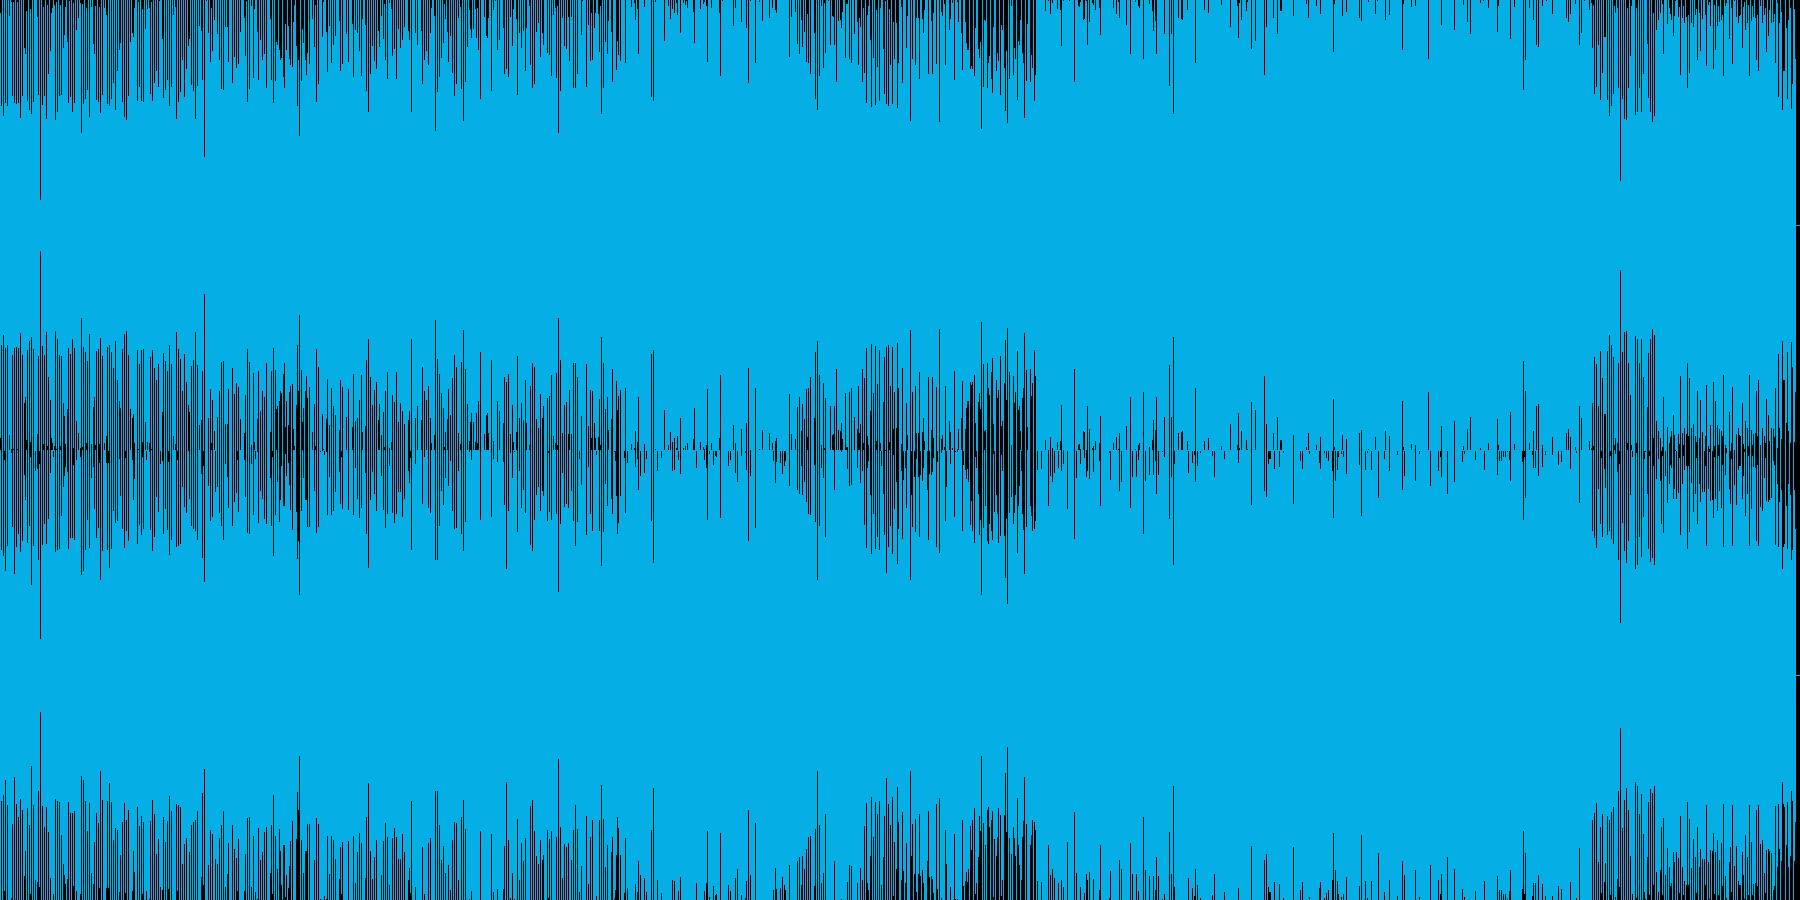 jazzyなハウスの再生済みの波形